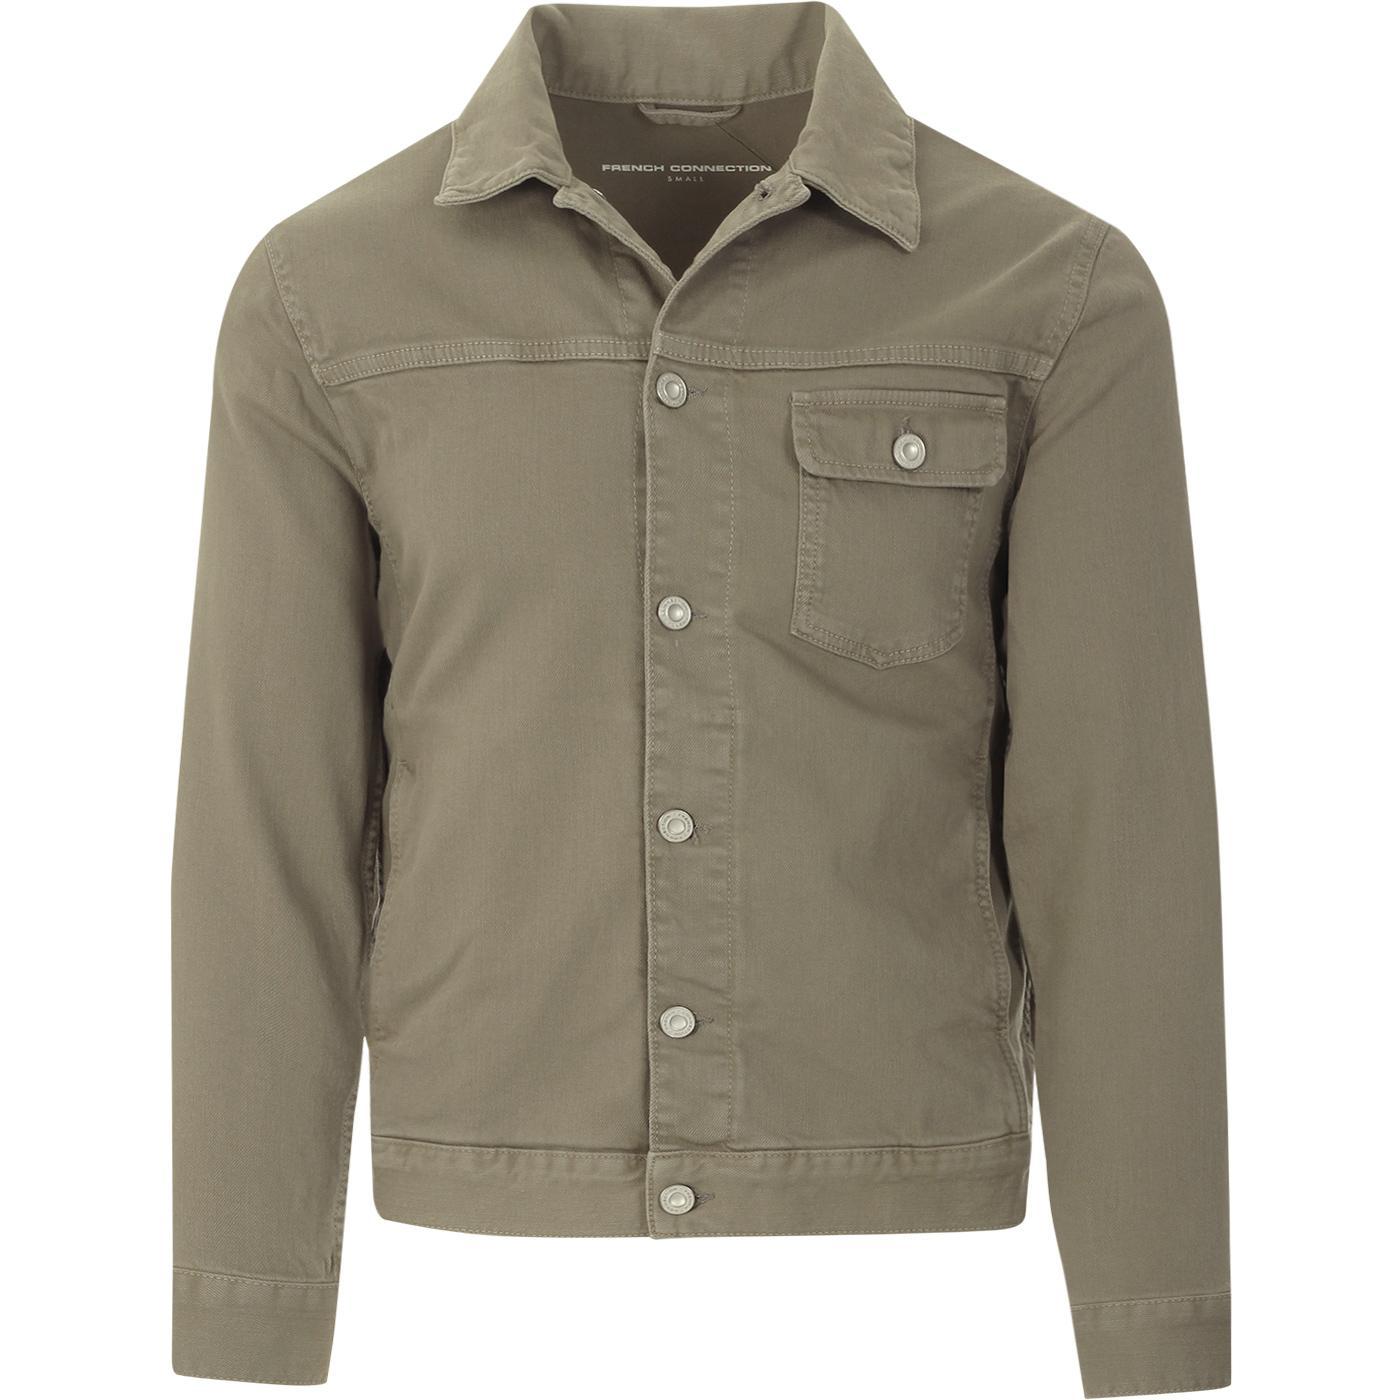 FRENCH CONNECTION Retro Military Denim Jacket